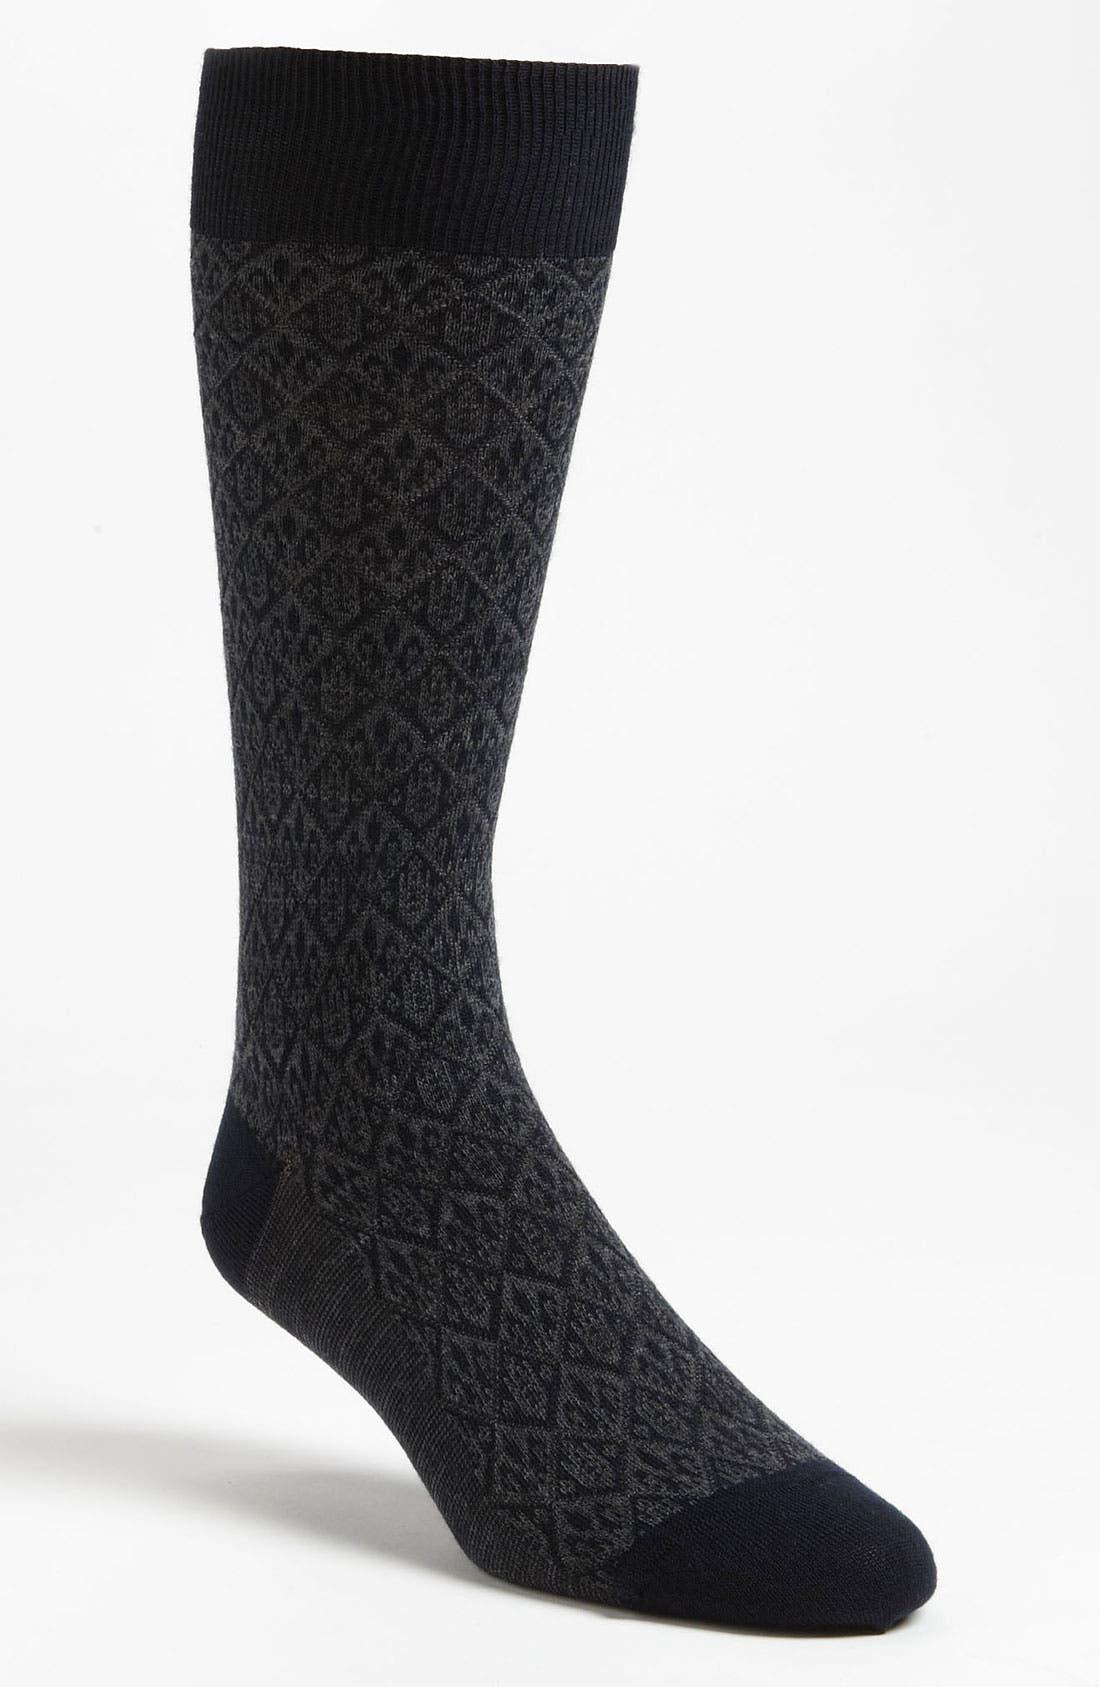 Alternate Image 1 Selected - Pantherella 'Vintage Collection' Fleur de Lis Socks